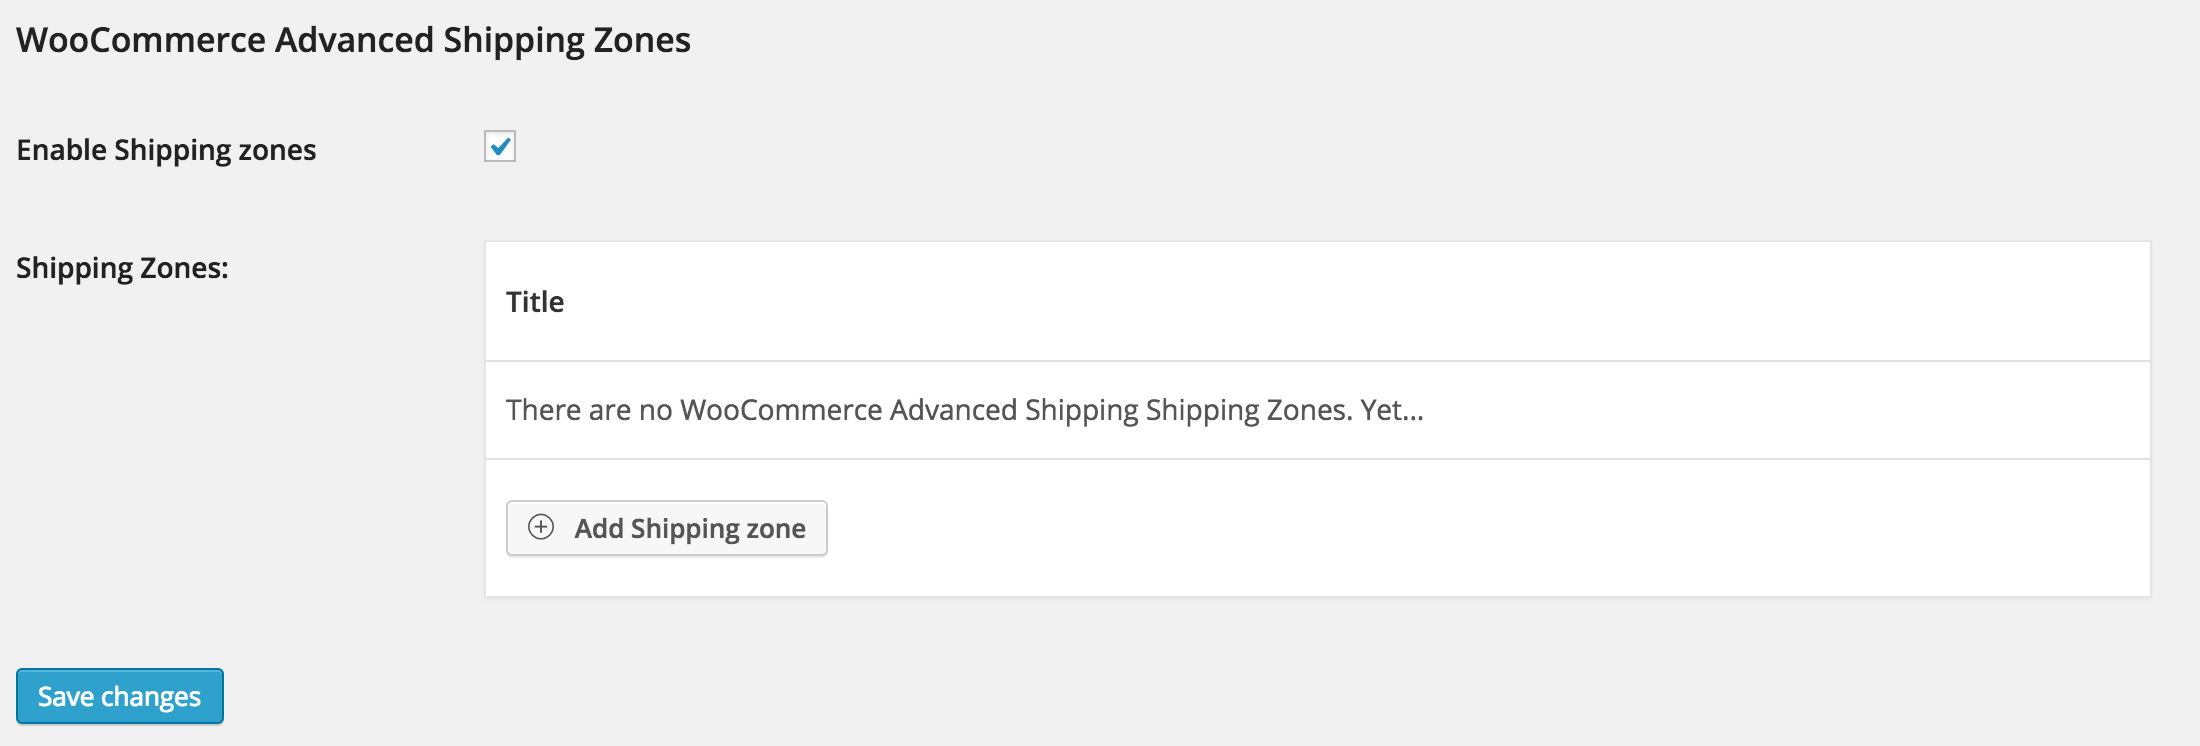 WooCommerce Advanced Shipping Zone